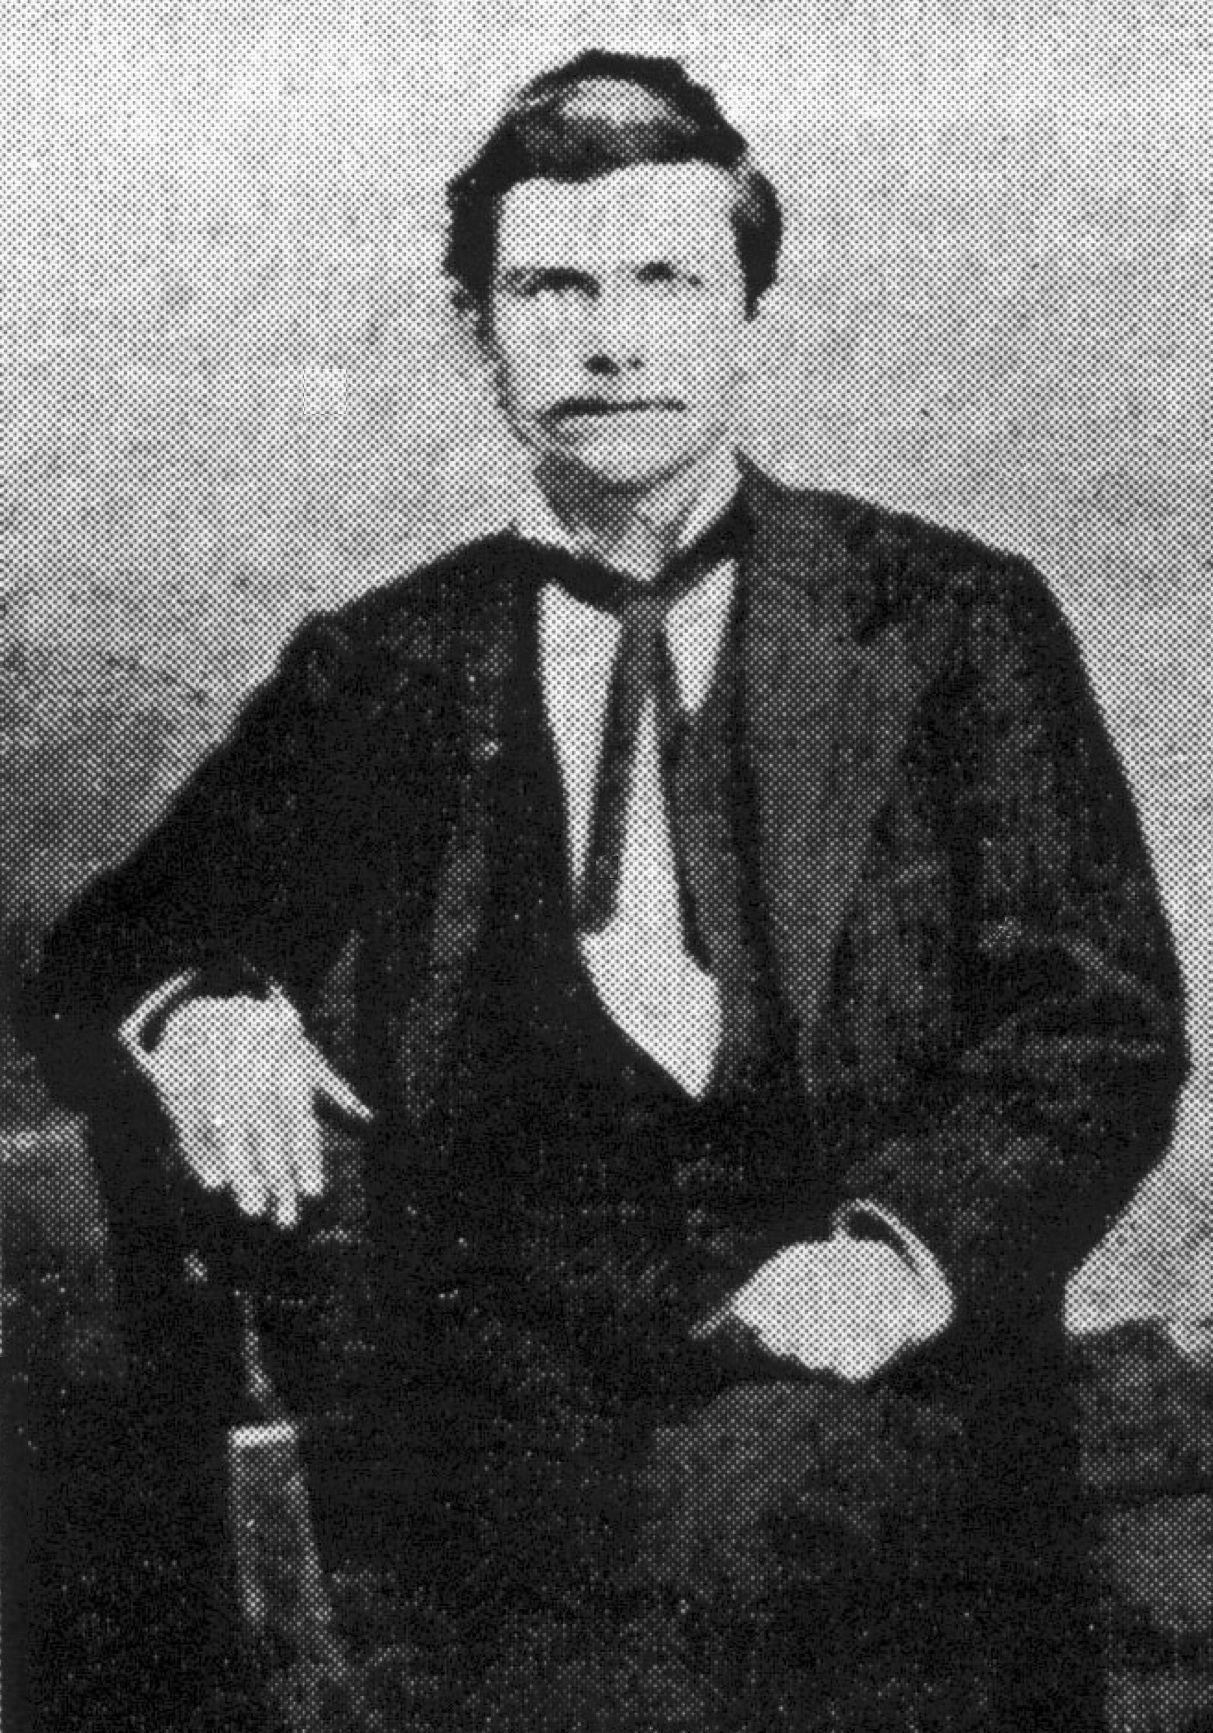 Ellis, John Francis